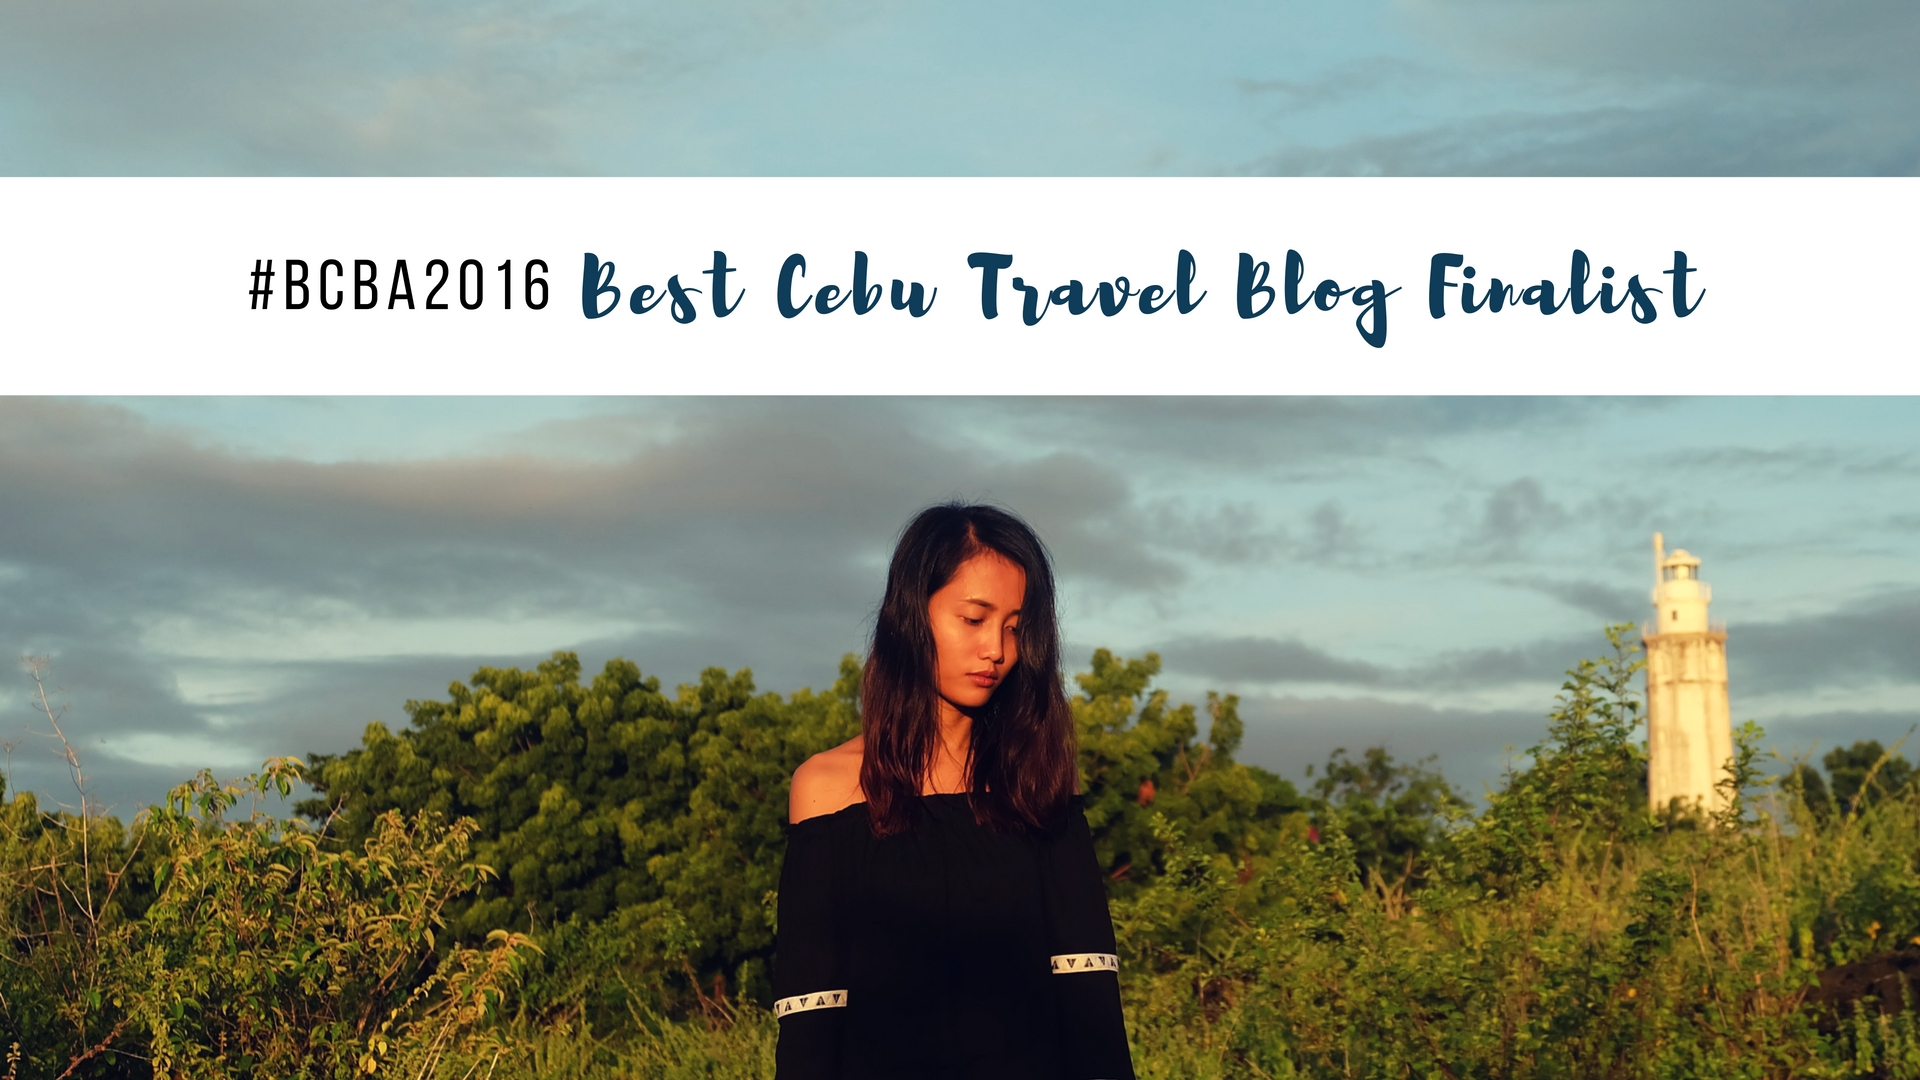 bcba-best-cebu-travel-blog-category-finalist-the-tiny-wanderer